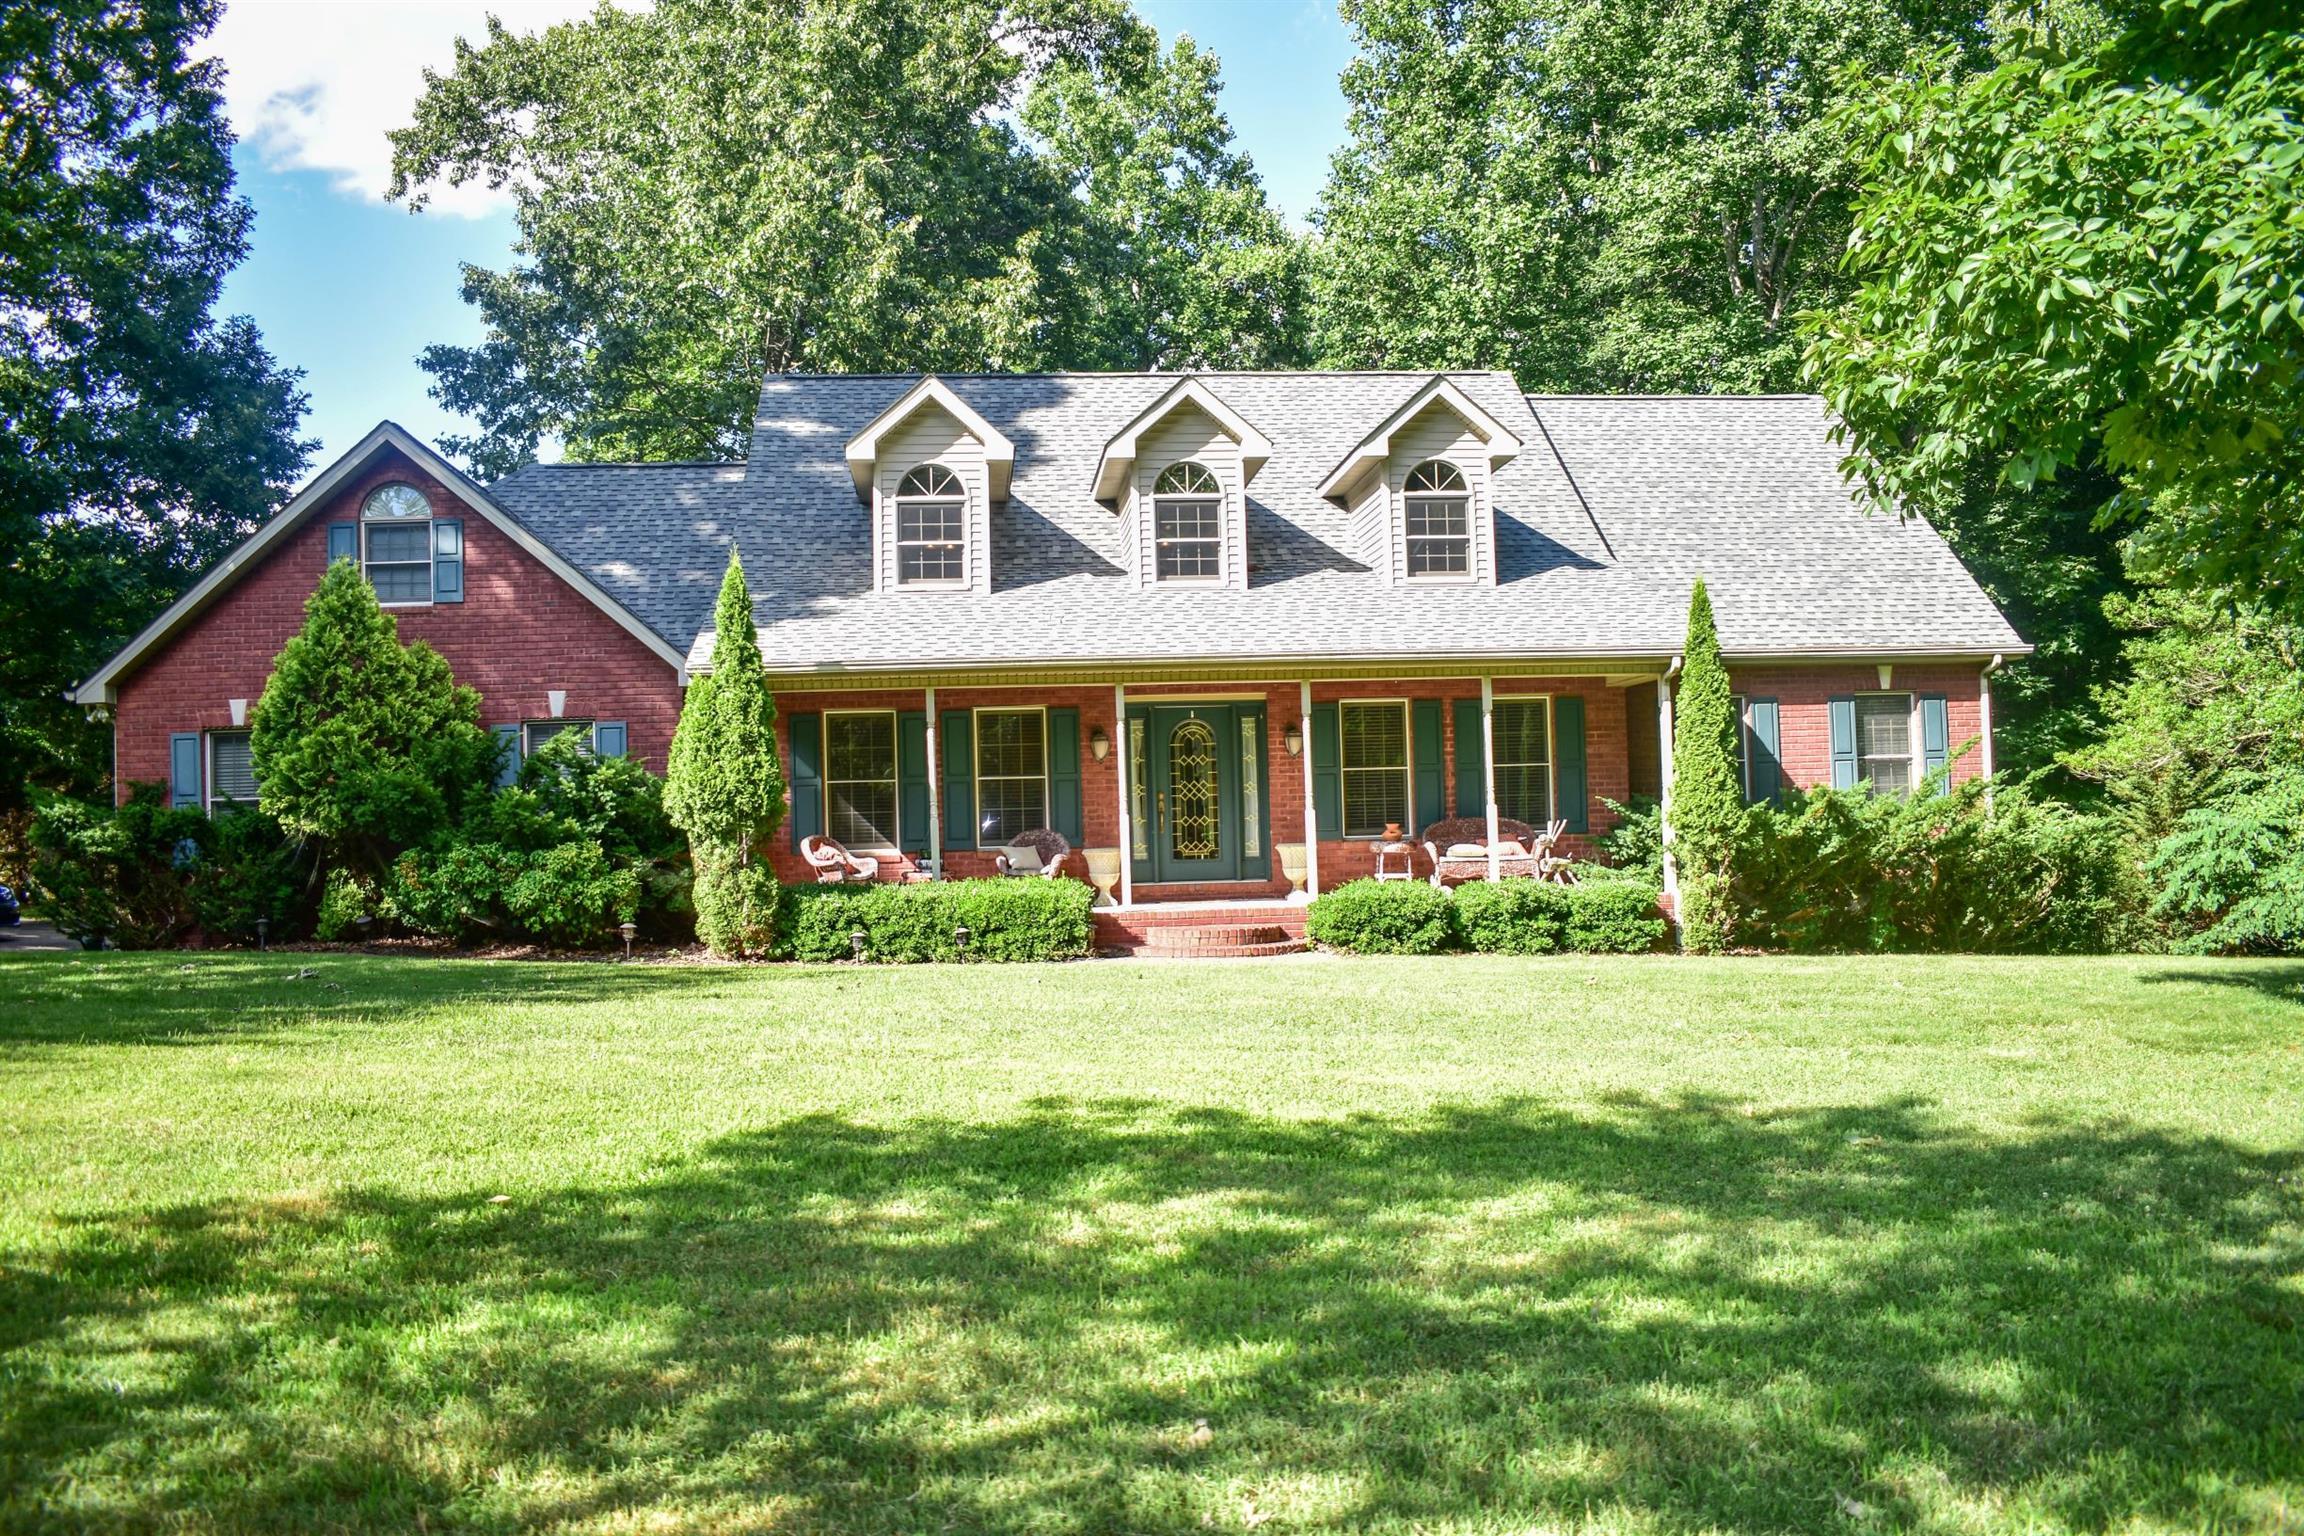 496 Perrys Pl, Lynchburg, TN 37352 - Lynchburg, TN real estate listing